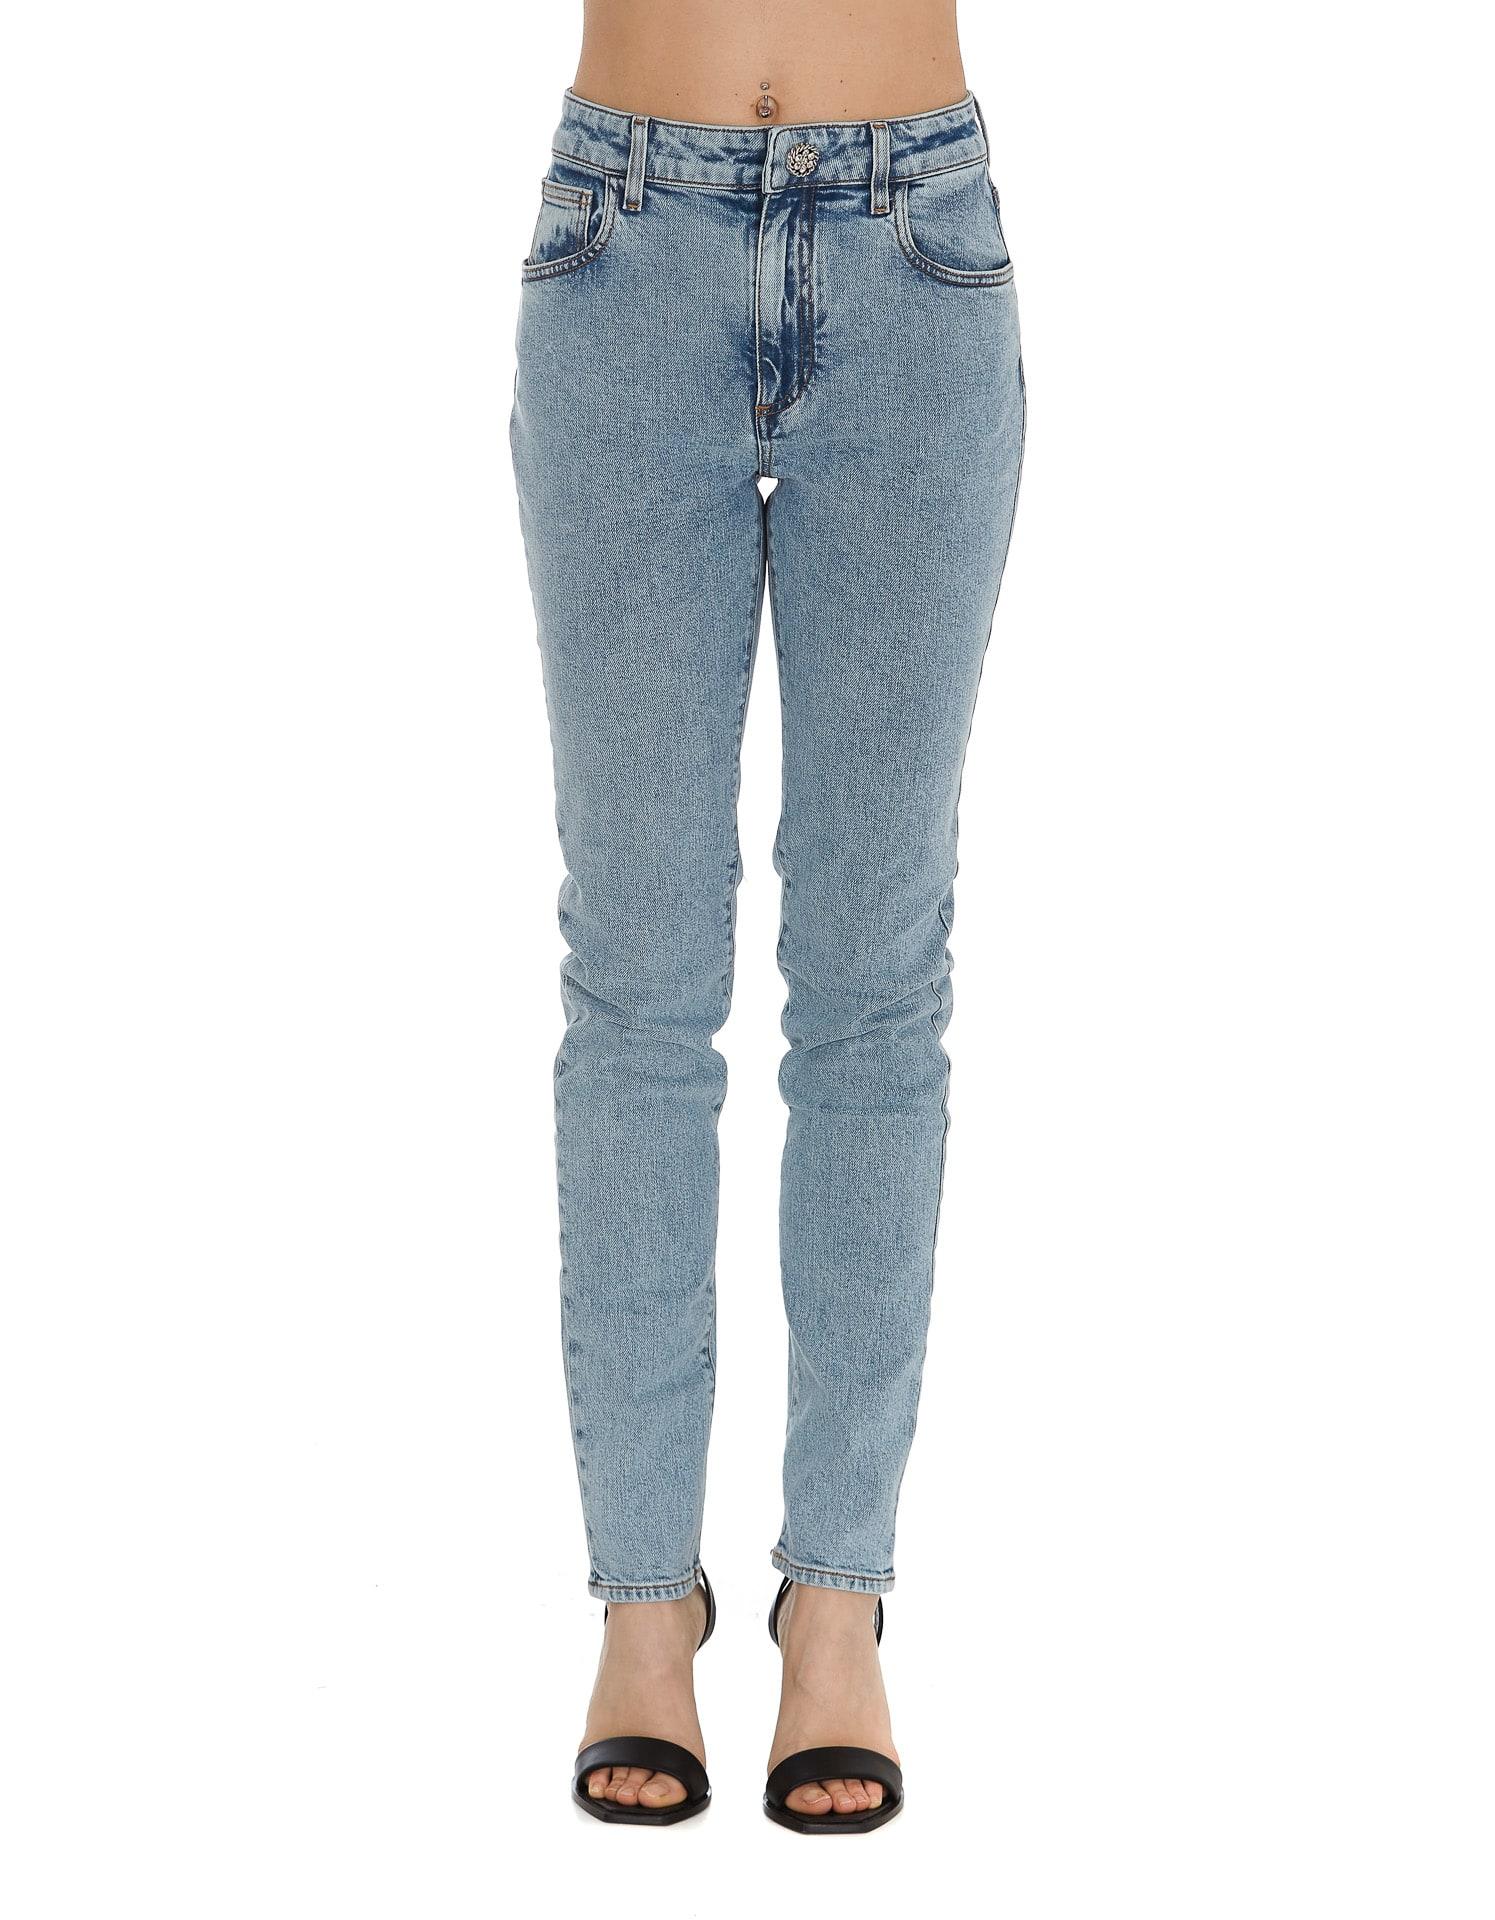 Alessandra Rich Jeans HIGH WAIST SKINNY DENIM